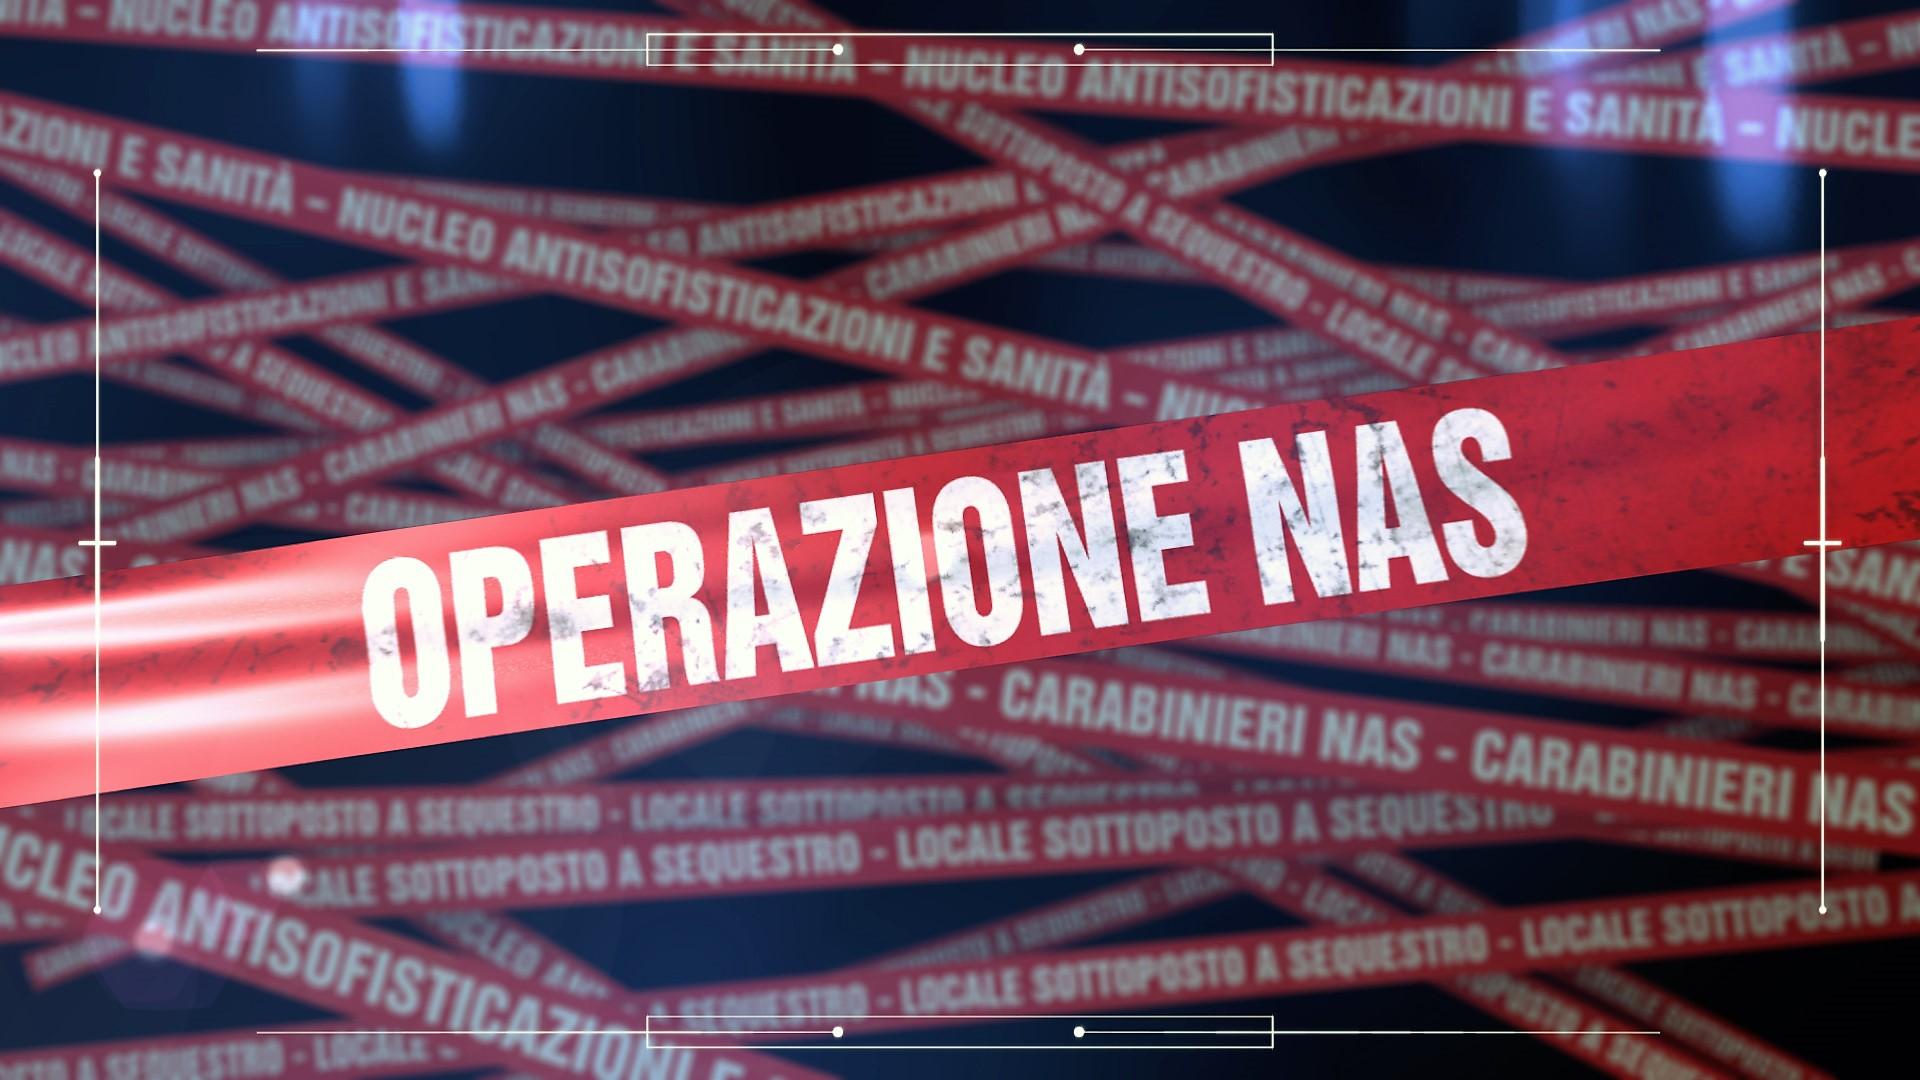 Operazione NAS, la docu serie in esclusiva su NOVE